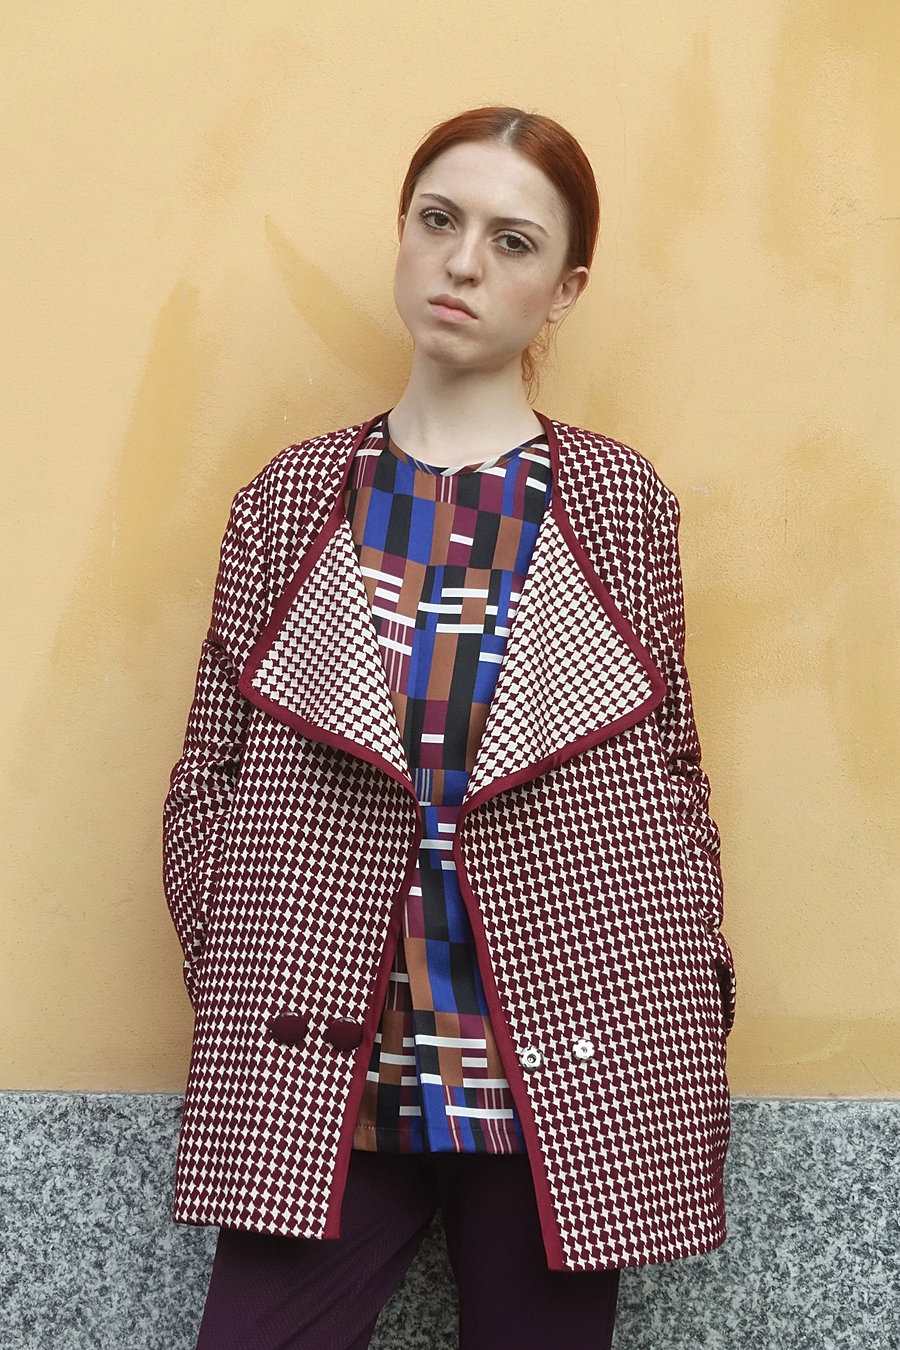 Wool jacquard checks coat and printed silk blouse